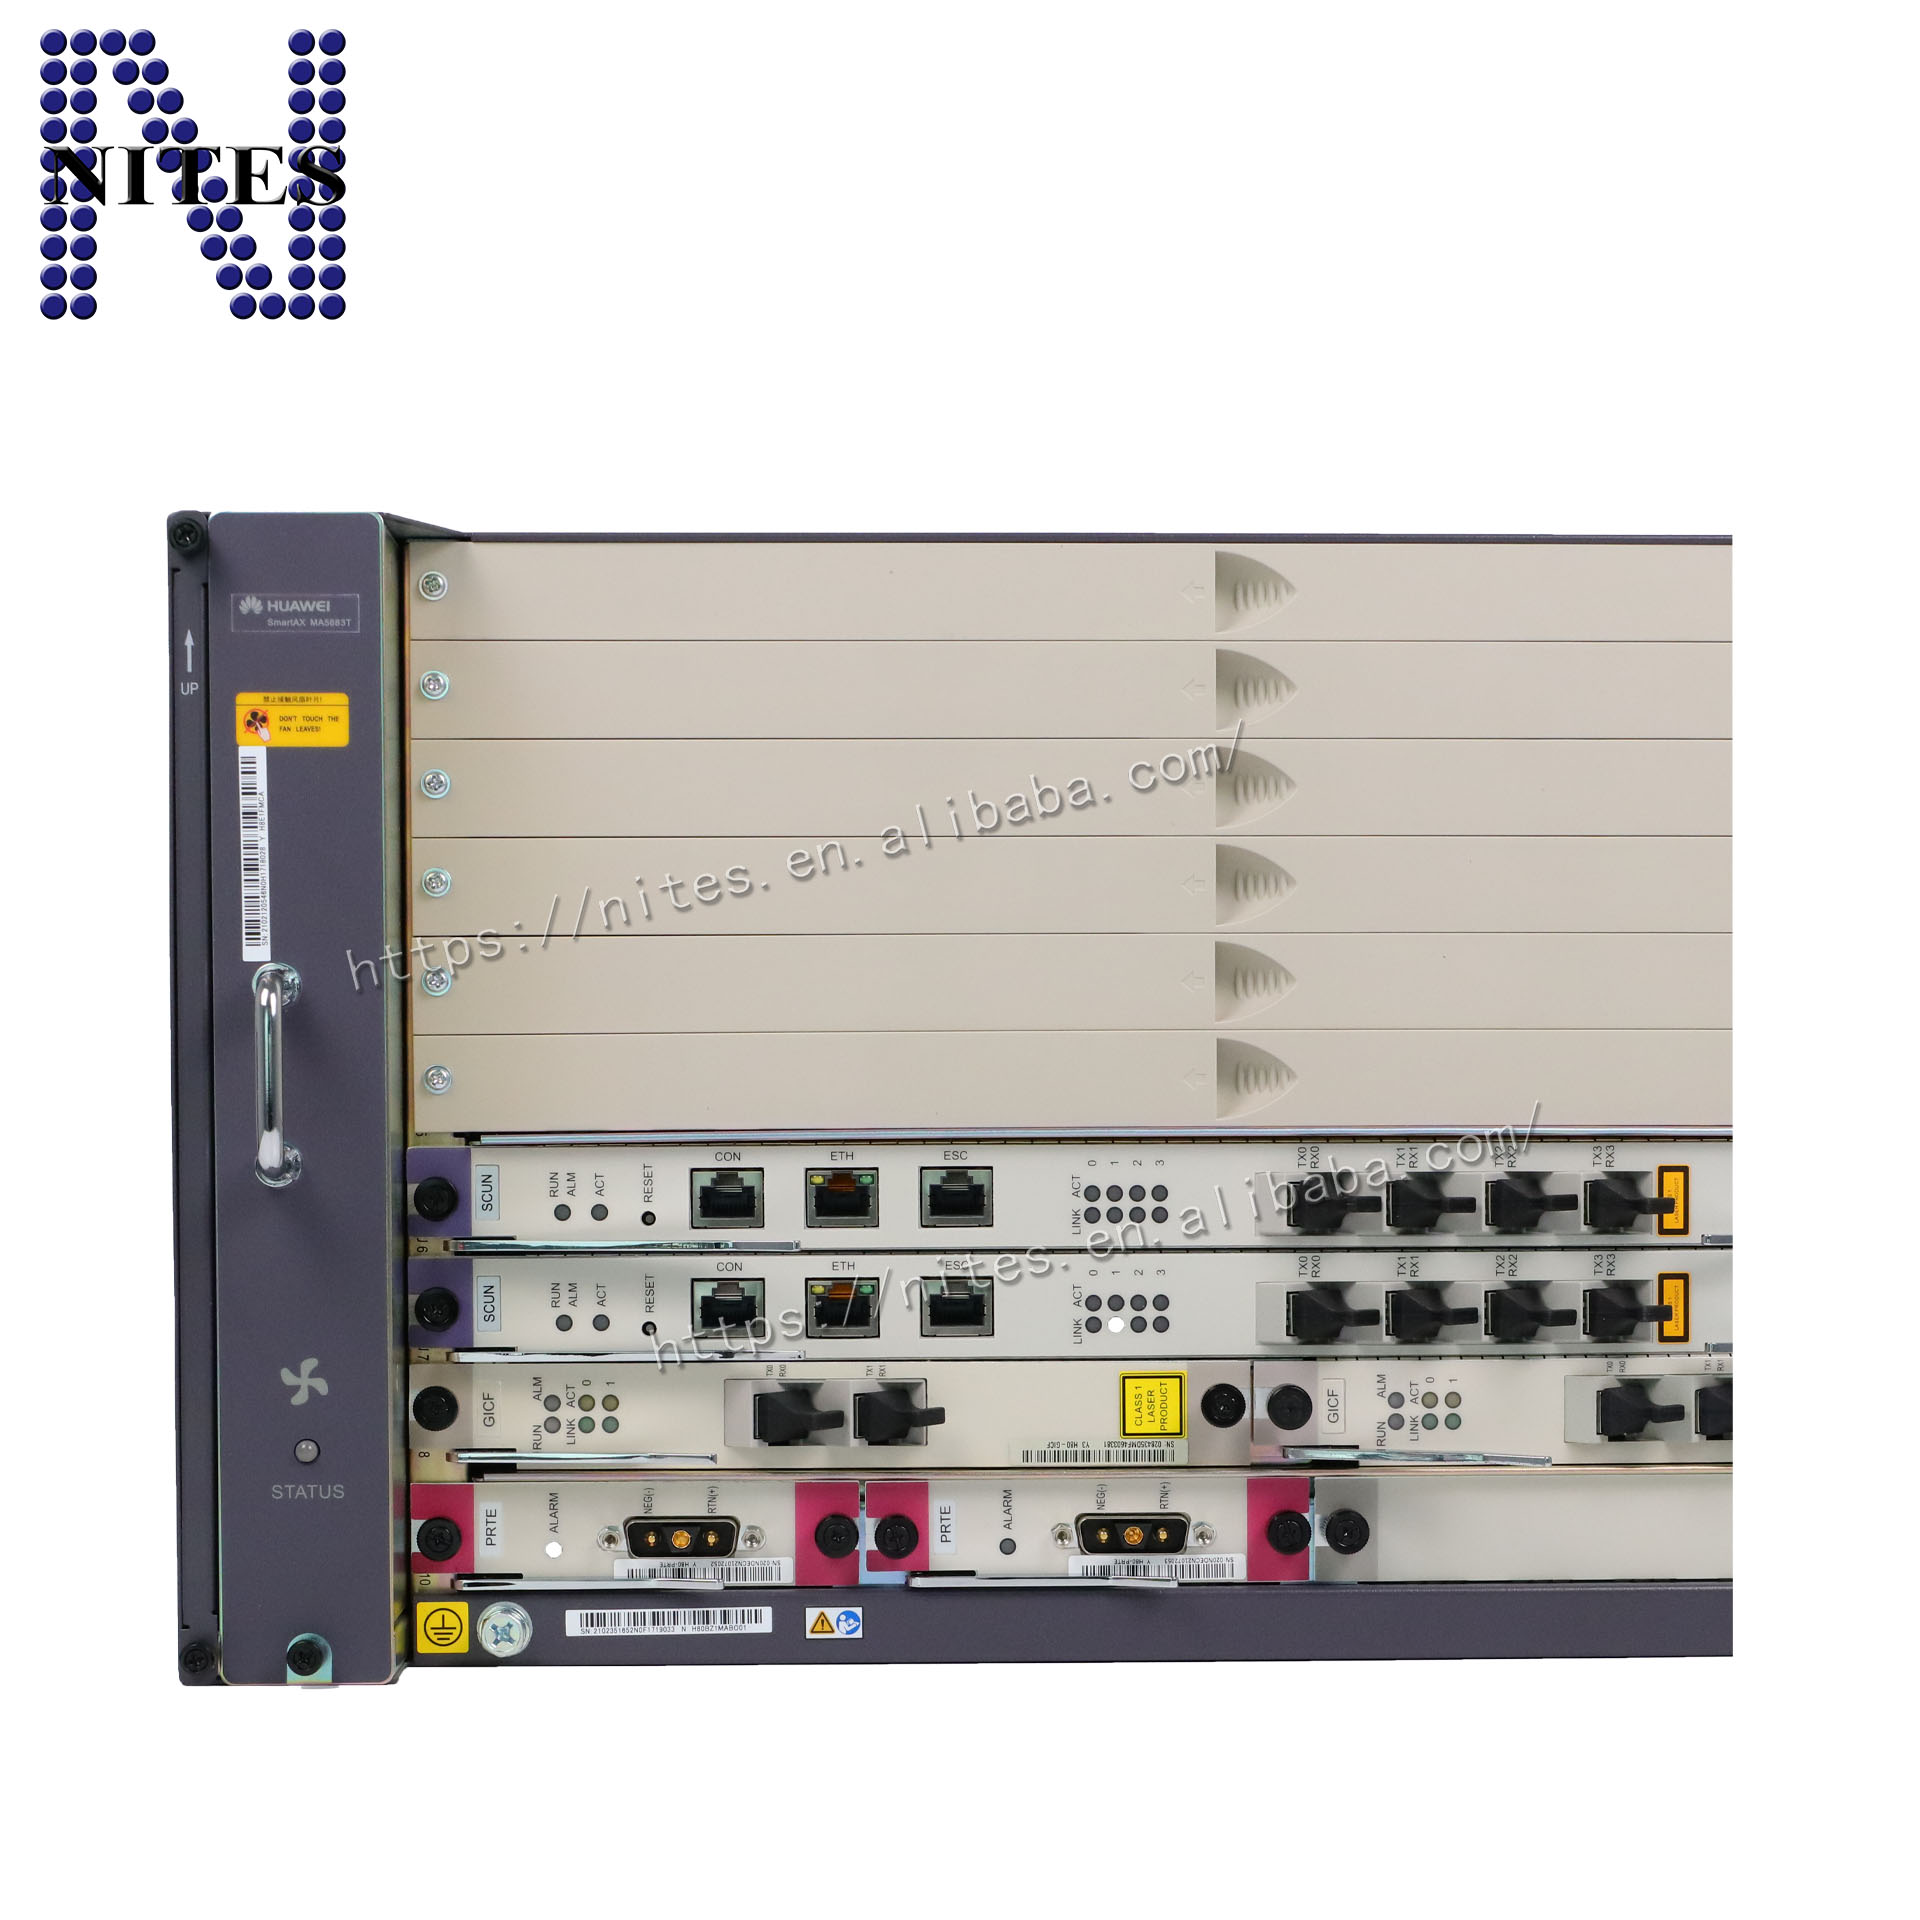 Sfp Modules For Ma5680t Ma5608t Olt Ma5683t Original Hua Wei 16 Ports Gpon Board With 16 Pcs Gpfd Class C